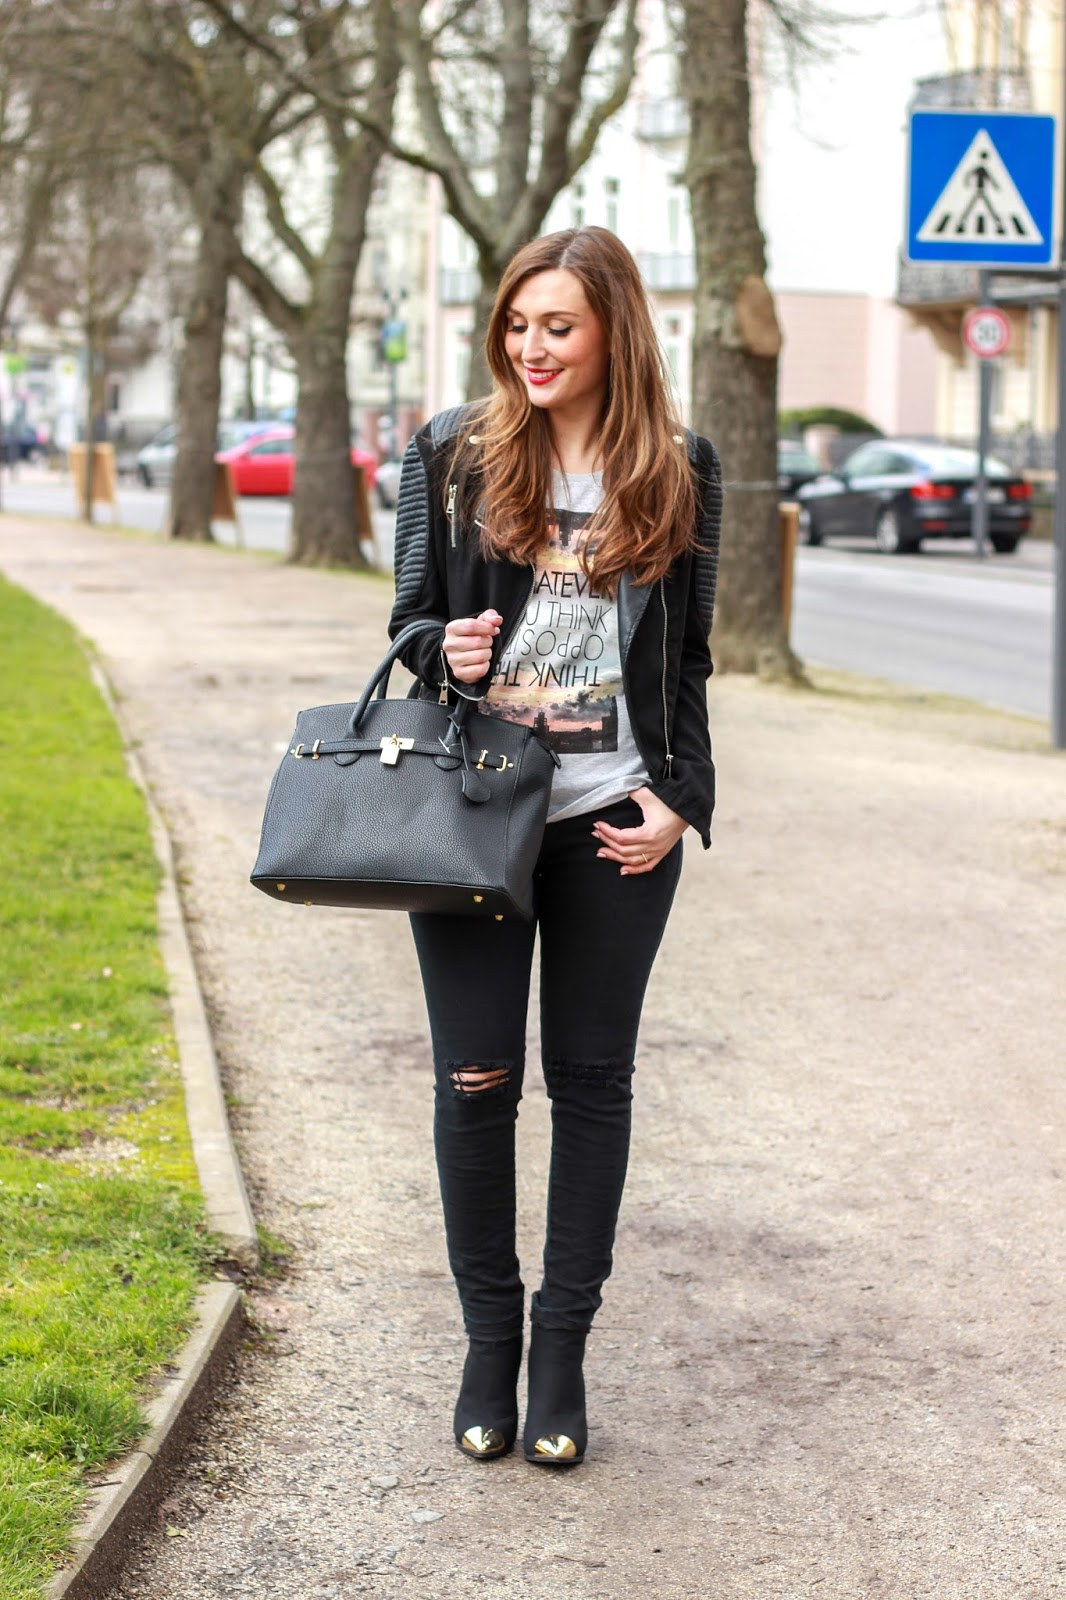 Fashionstylebyjohanna - Streetstyle - Streetstyleblogger - Streetstyle Germany - German Fashionblogger - Streetstyleinspiration